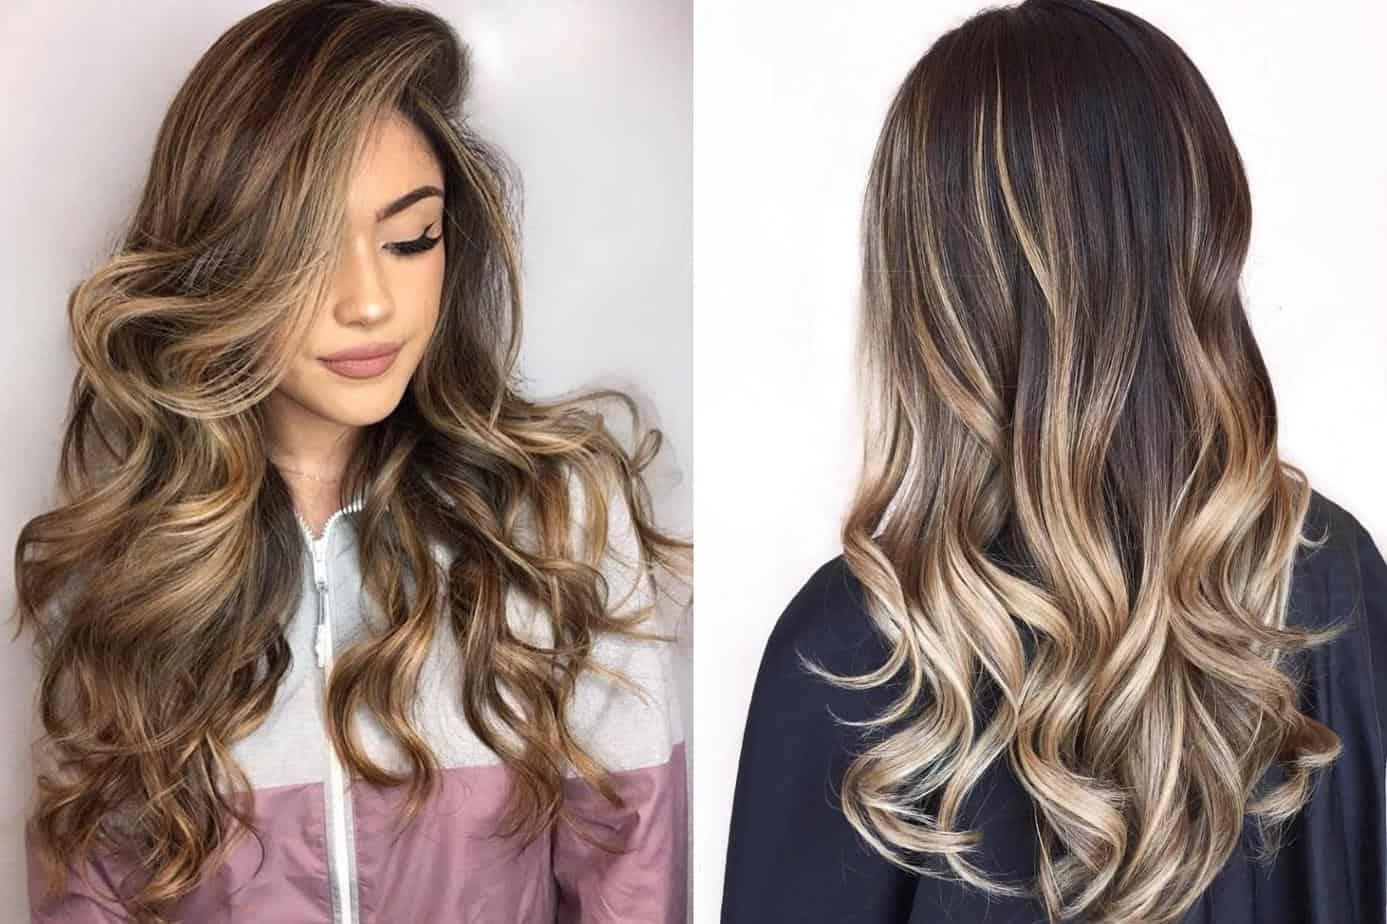 Balayage Hairstyles 2021: Top 17 Ways to Make It Look Stunning - Elegant Haircuts